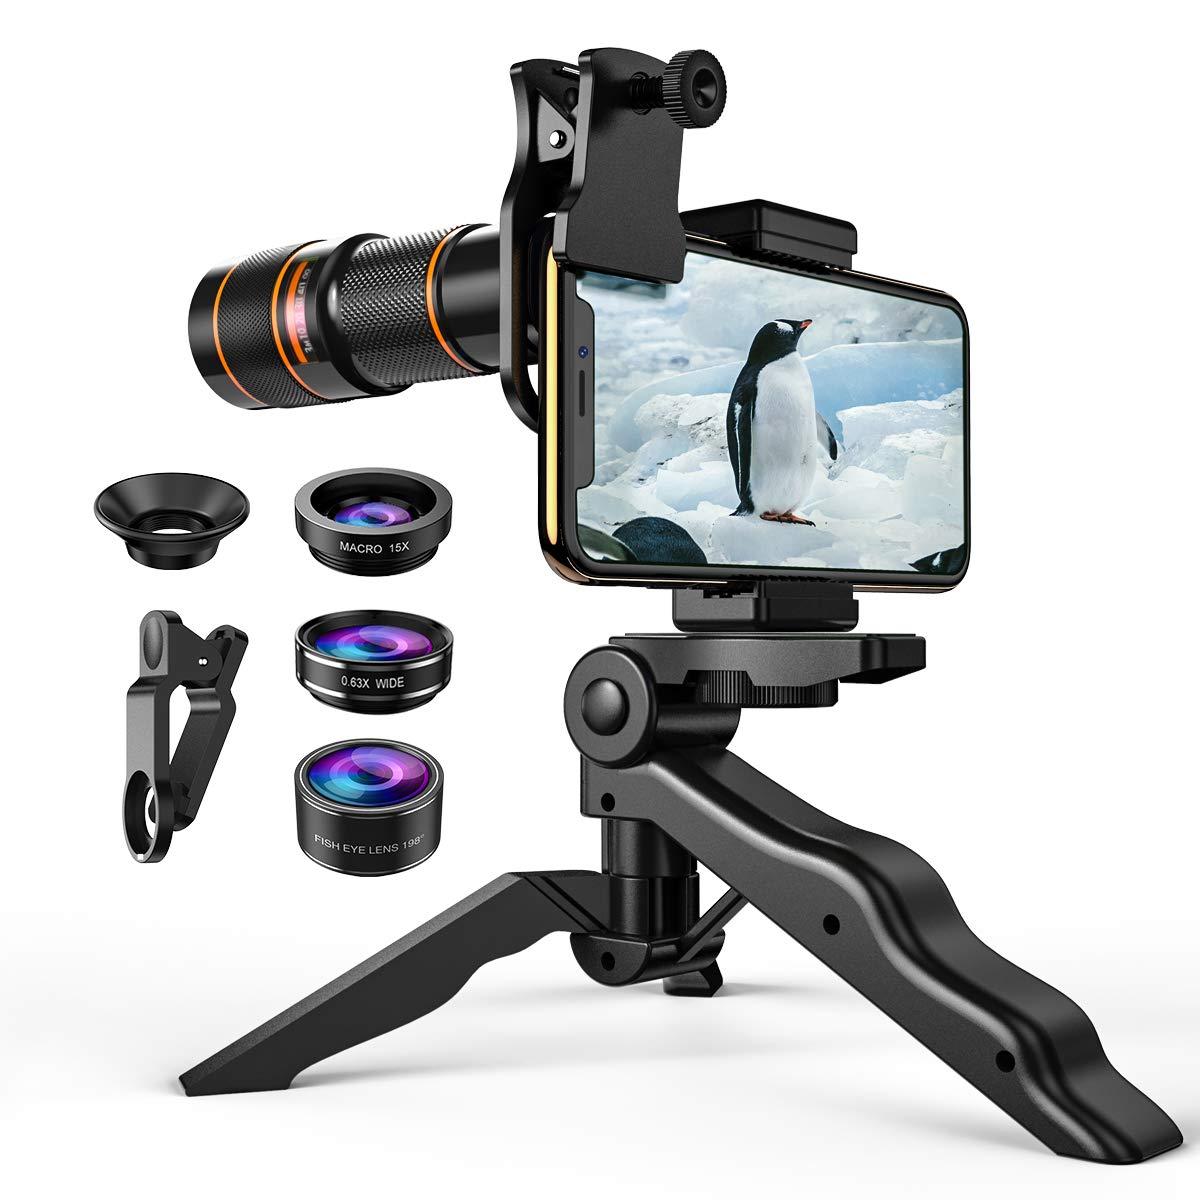 4bc0cb1921514c Criacr Phone Camera Lens, 4 in 1 Cell Phone Lens Kit for iPhone X Lenses